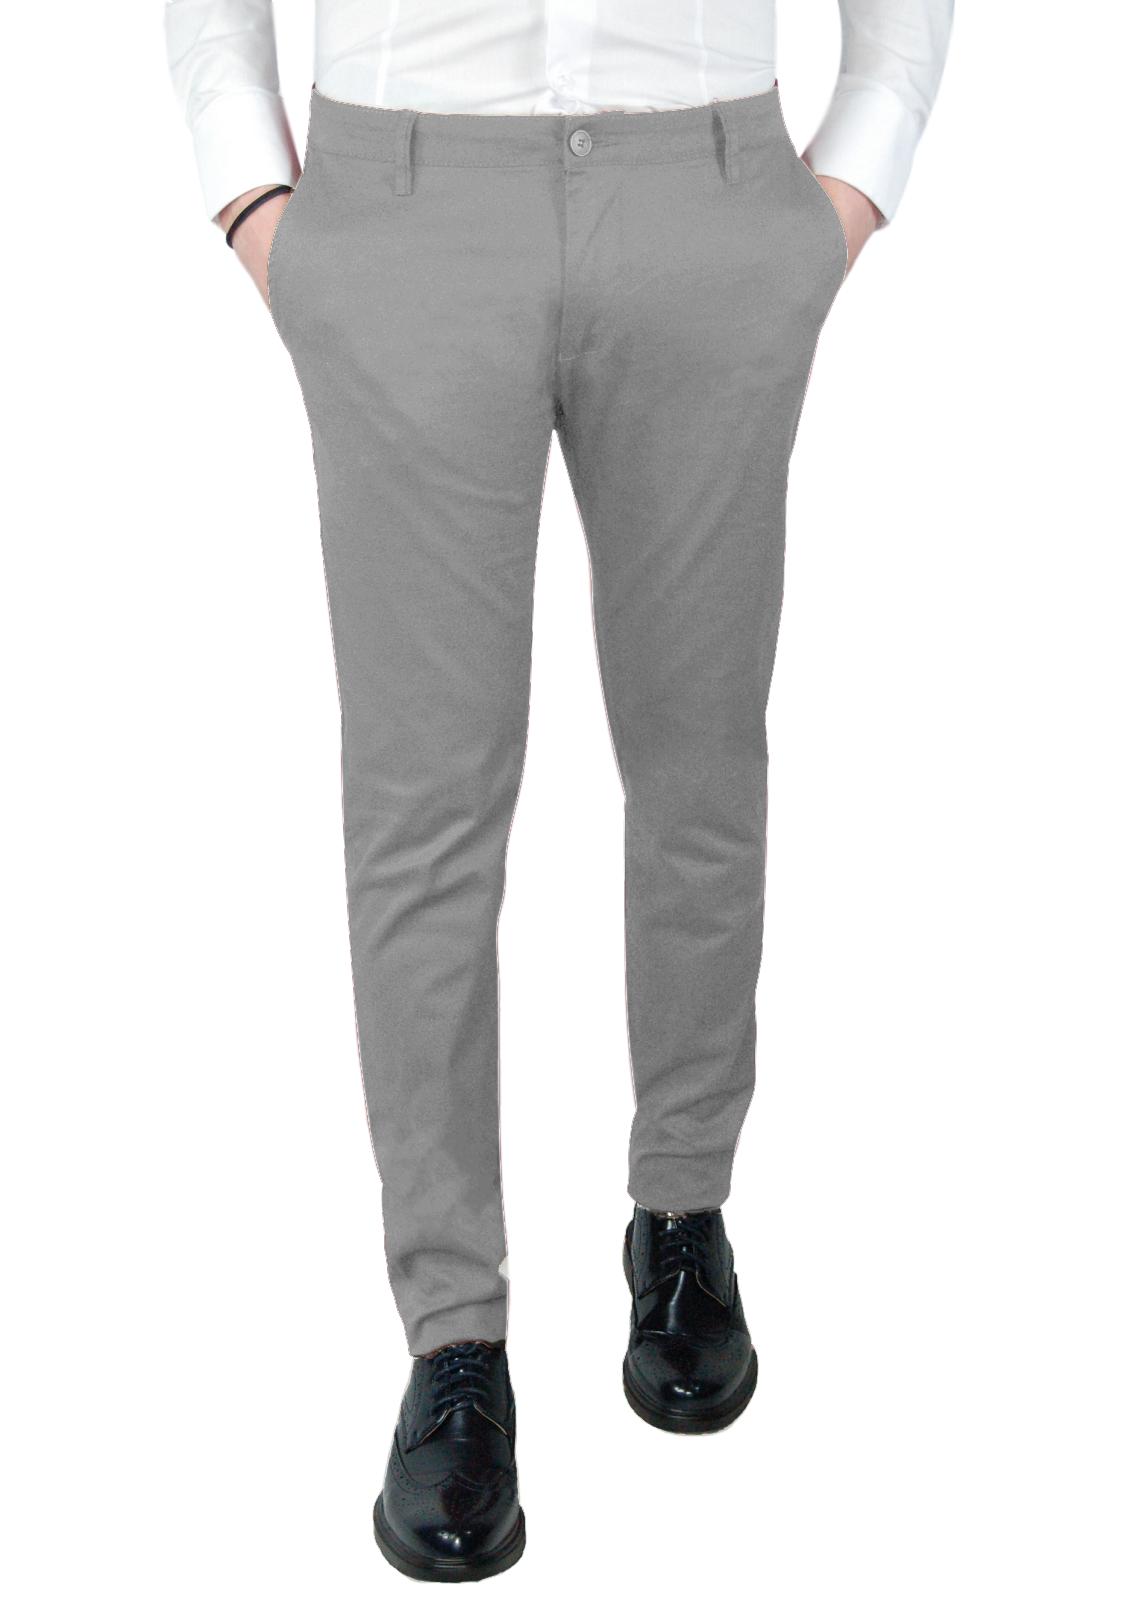 Pantalone-Uomo-Chino-Nero-Bianco-Primaverile-slim-fit-tasca-america-Primavera miniatura 19